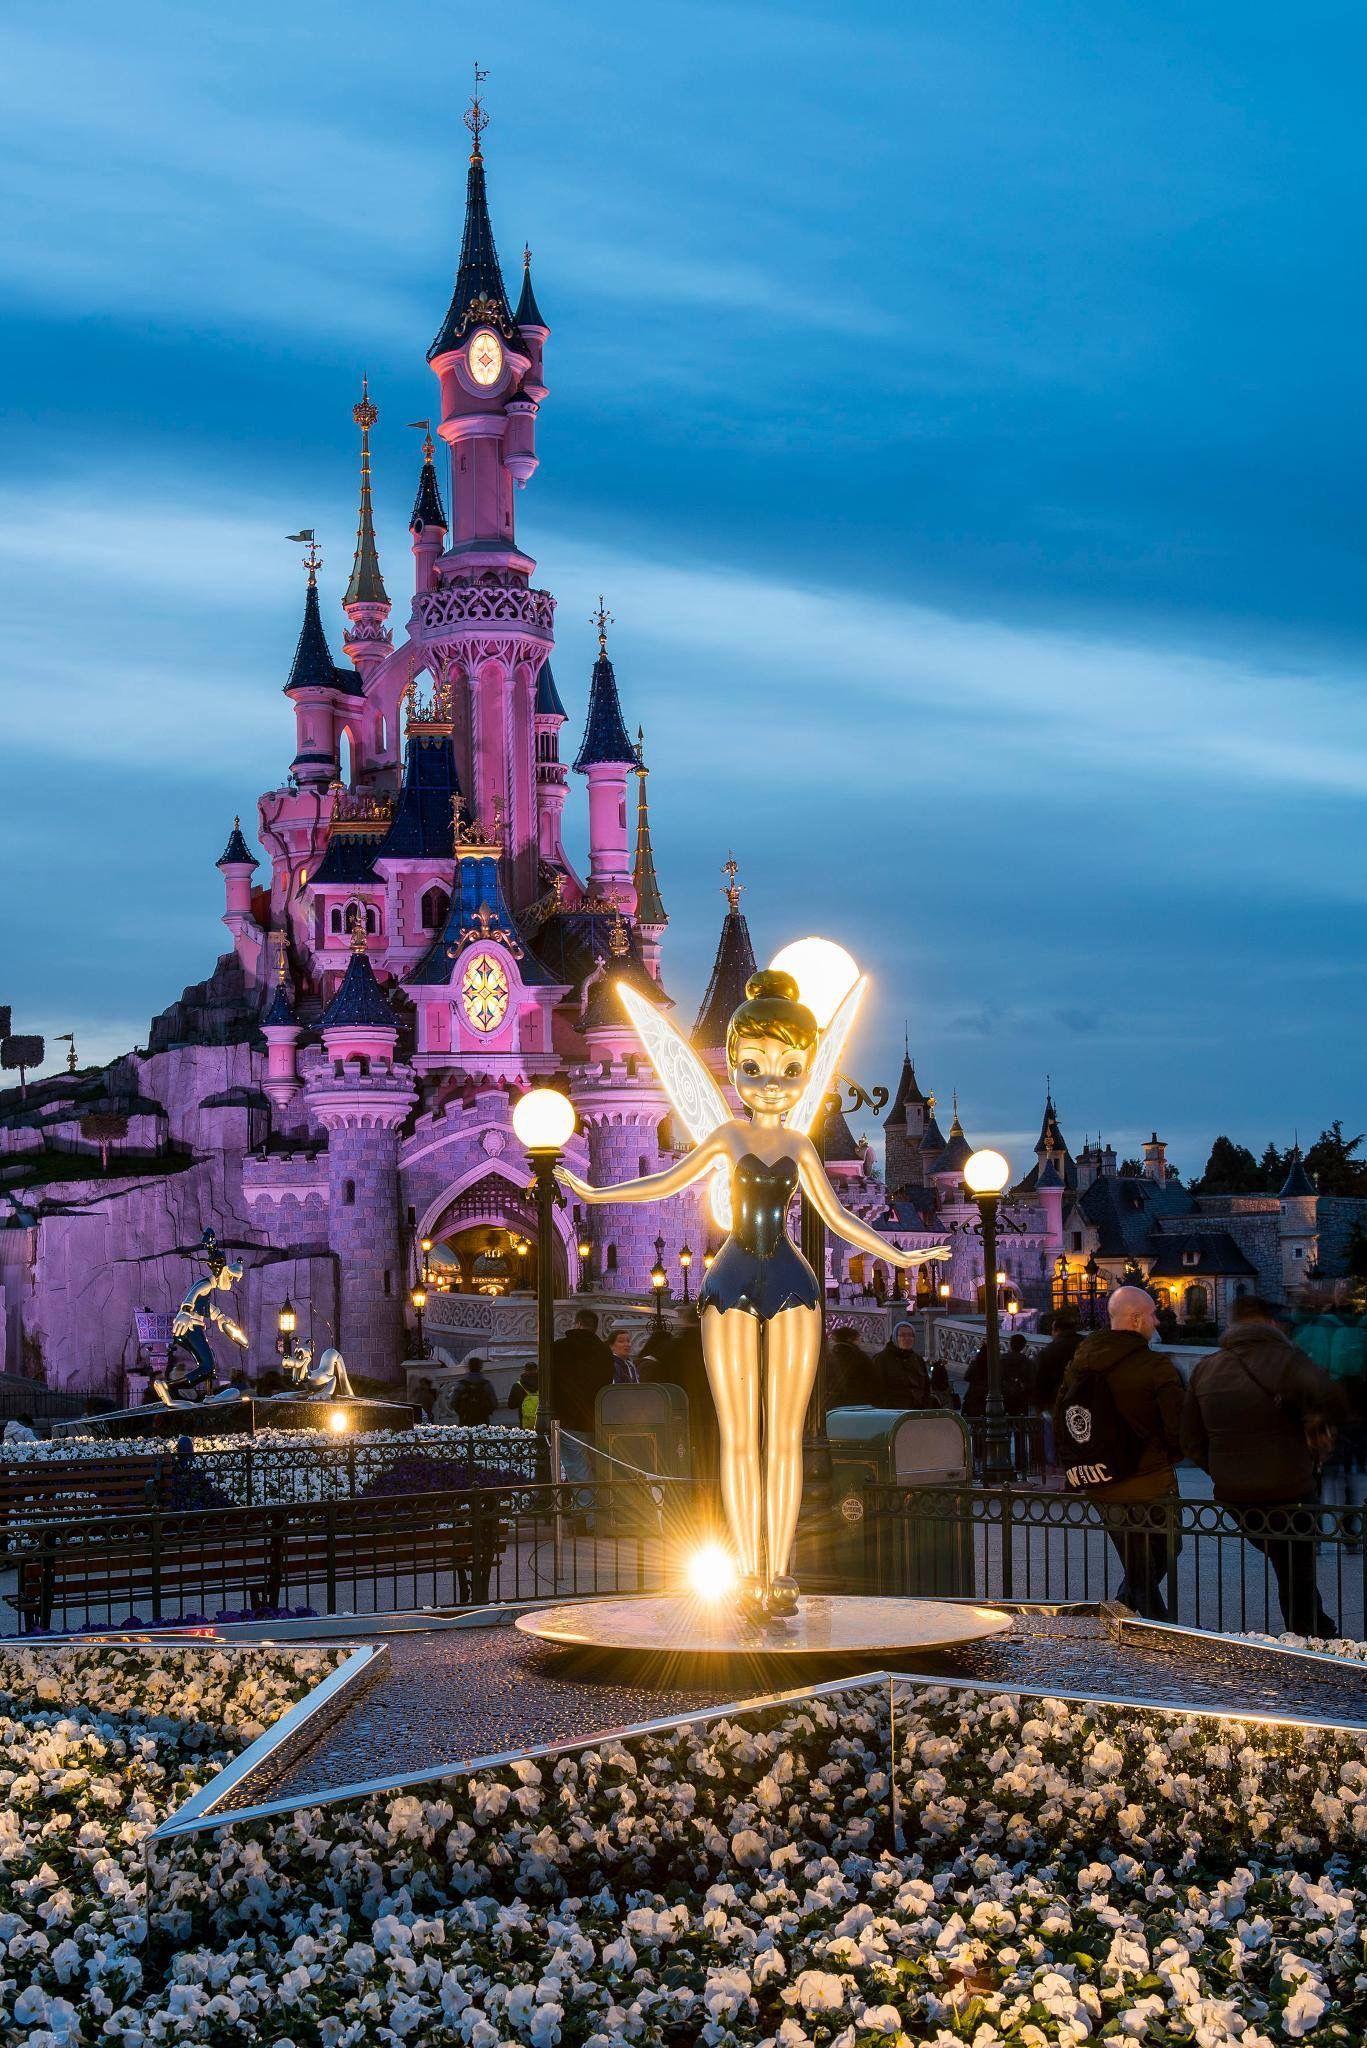 I Do Believe In Fairies I Do I Do Peter Pan Disney Paris Disneyland Paris Sleeping Beauty Castle